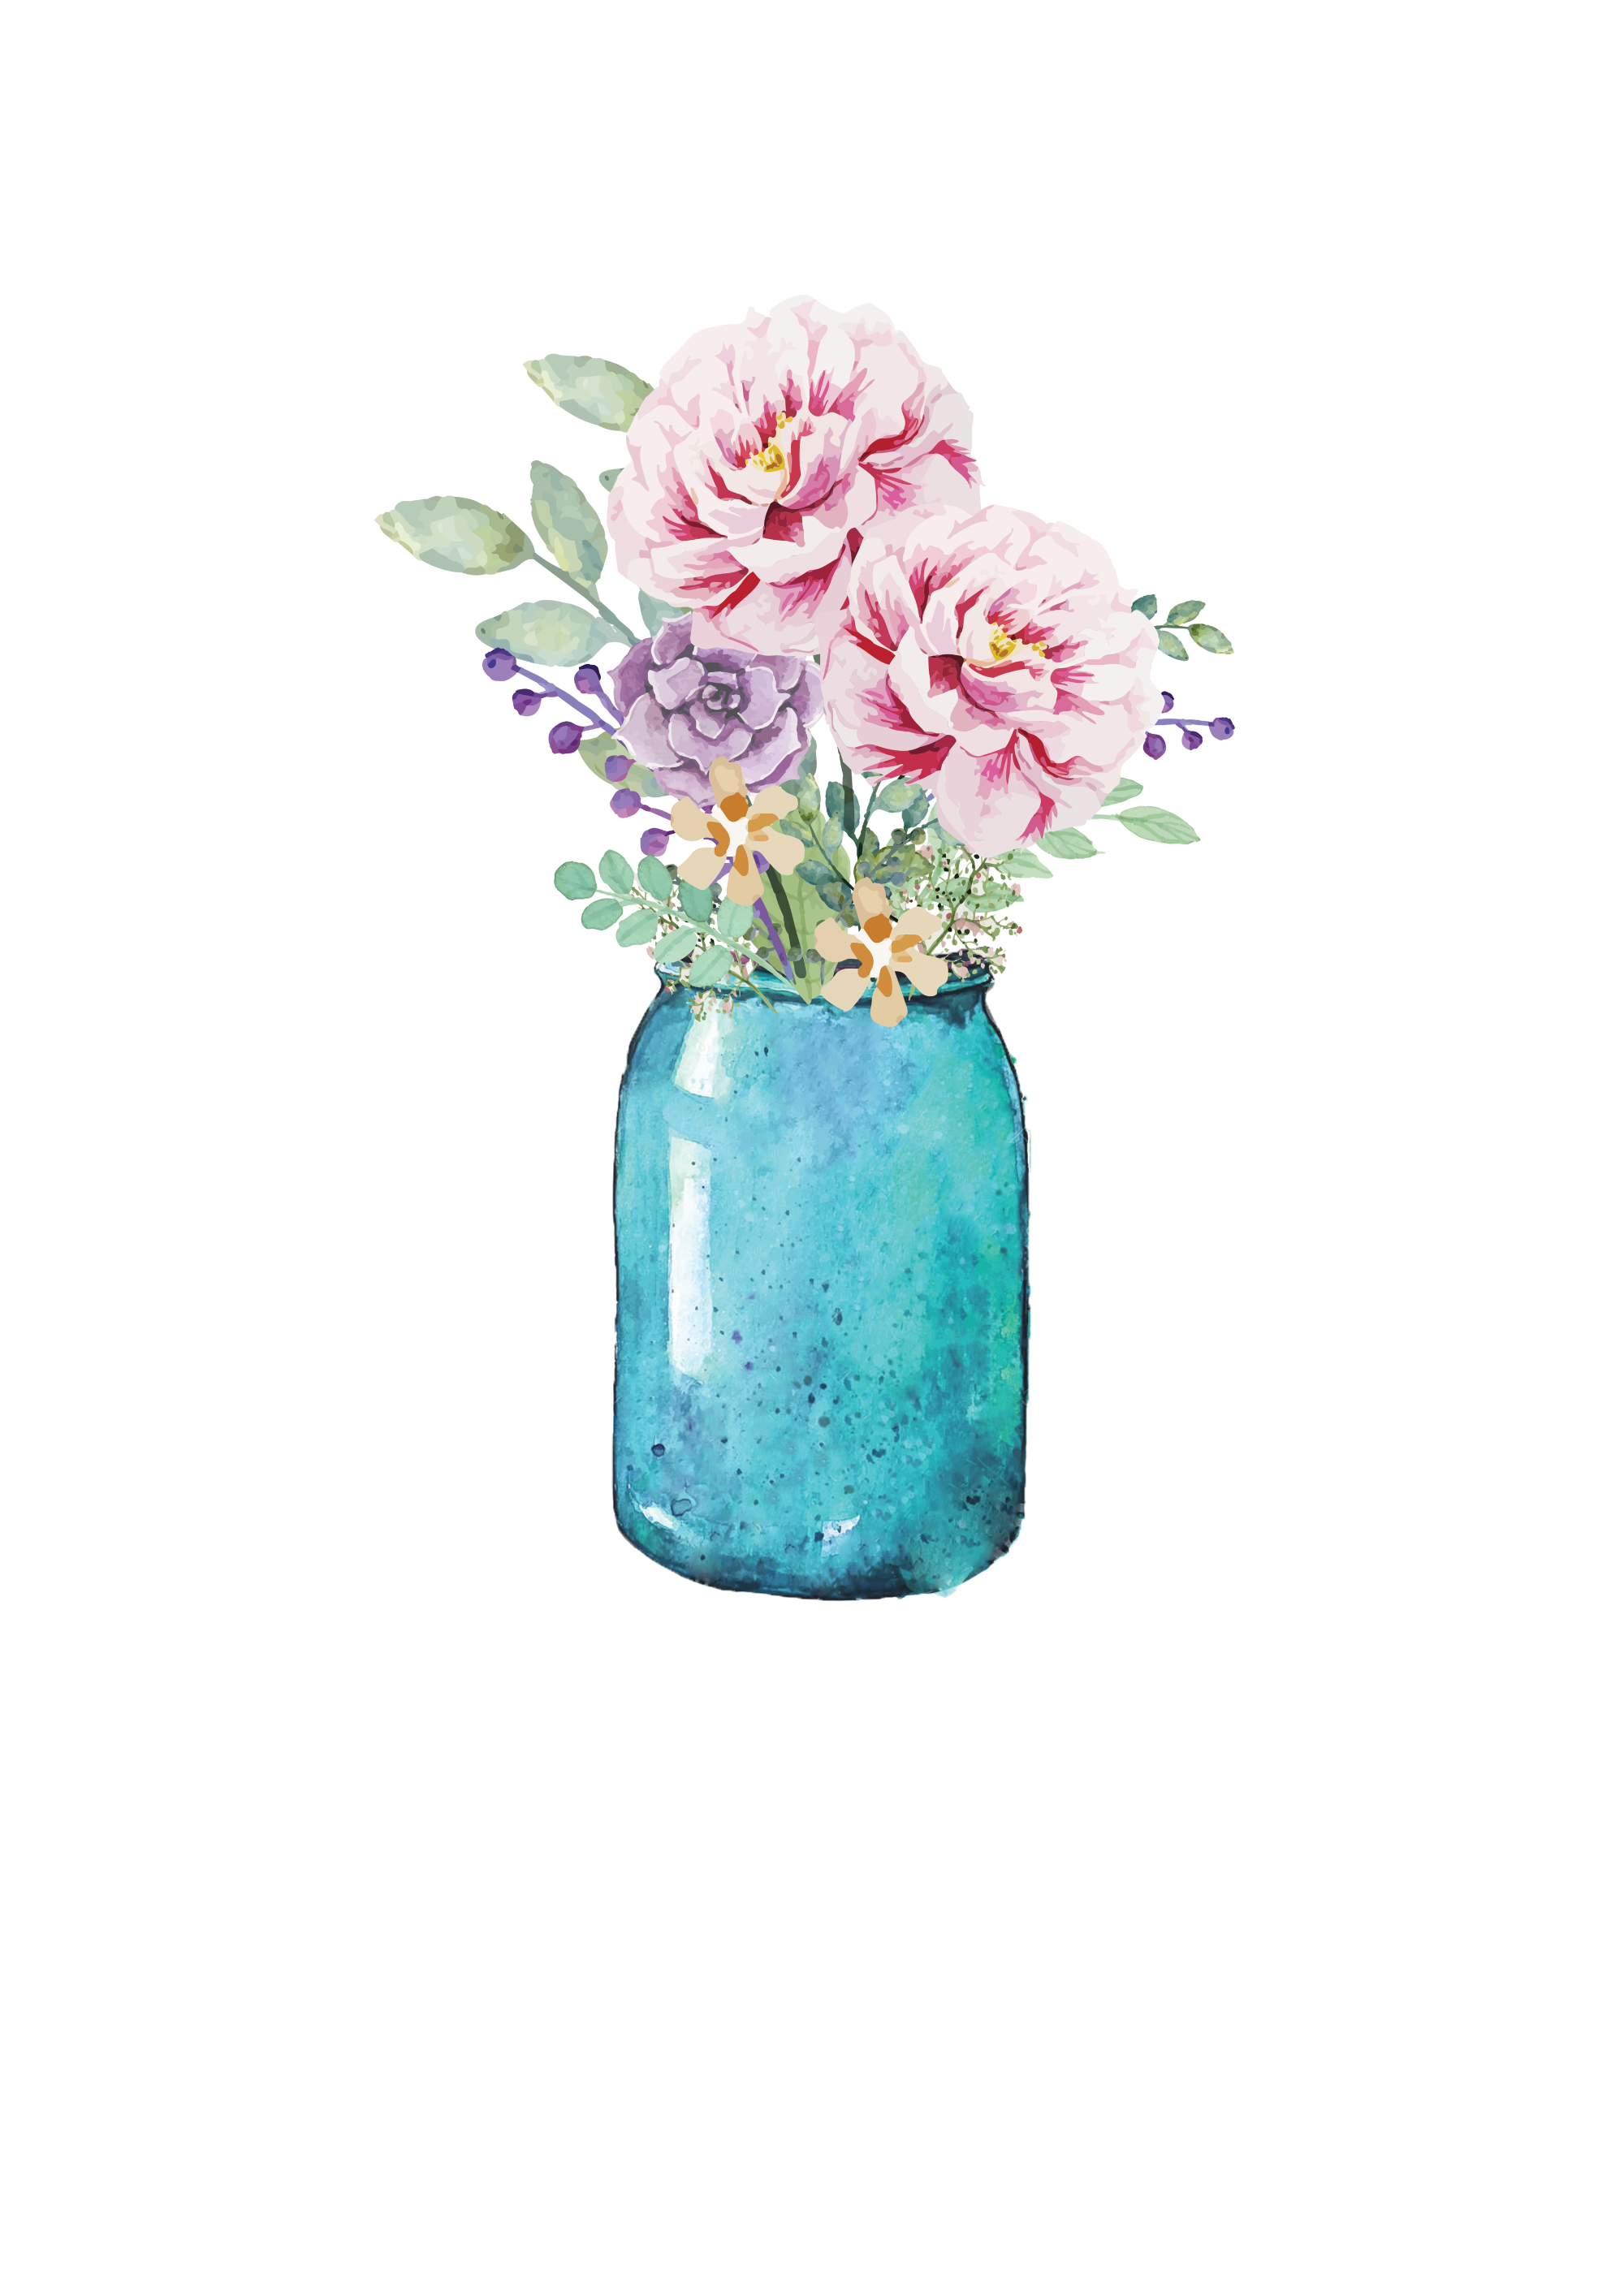 Mason jar flower clipart clip library stock Lauren Baxter : Flowers in a Mason Jar | Wallpaper | Pinterest | Jar ... clip library stock